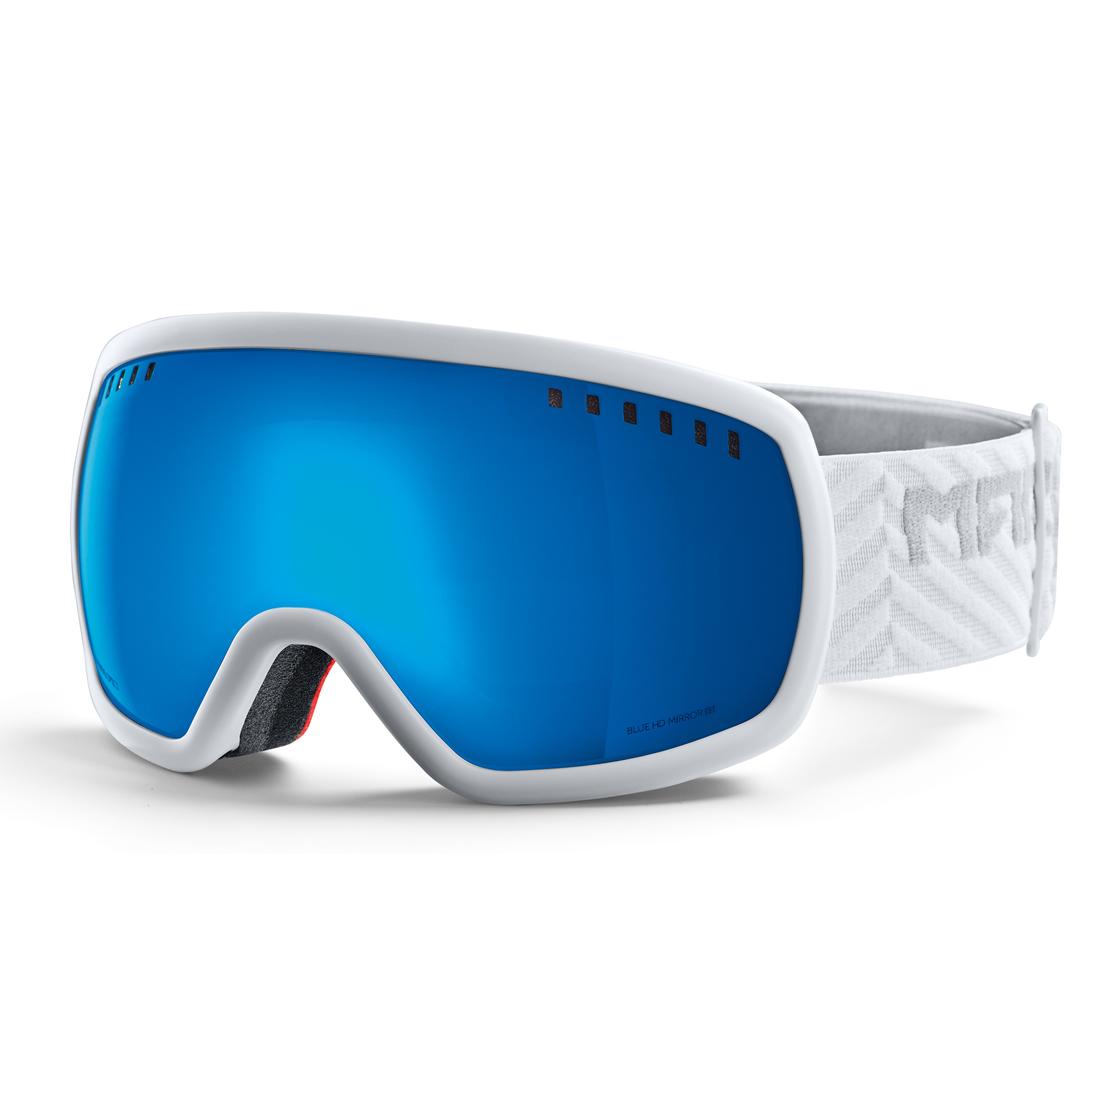 Masque de ski Marker 16:9